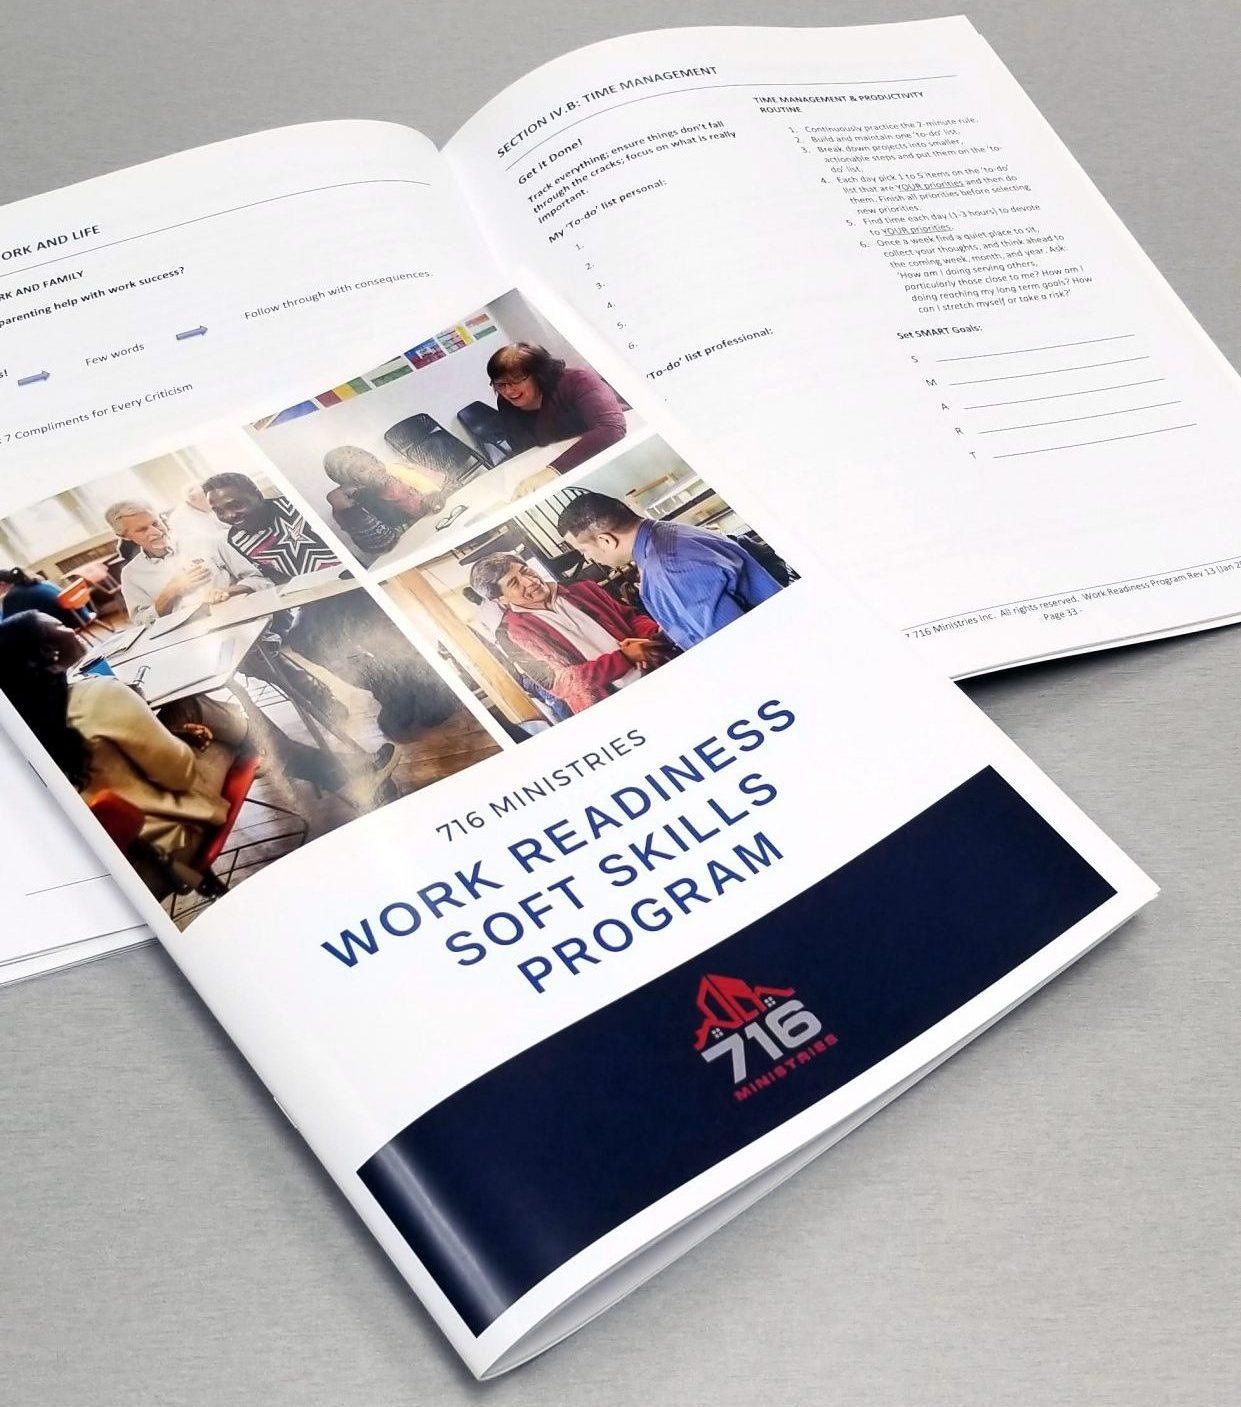 716 Ministries Workbook